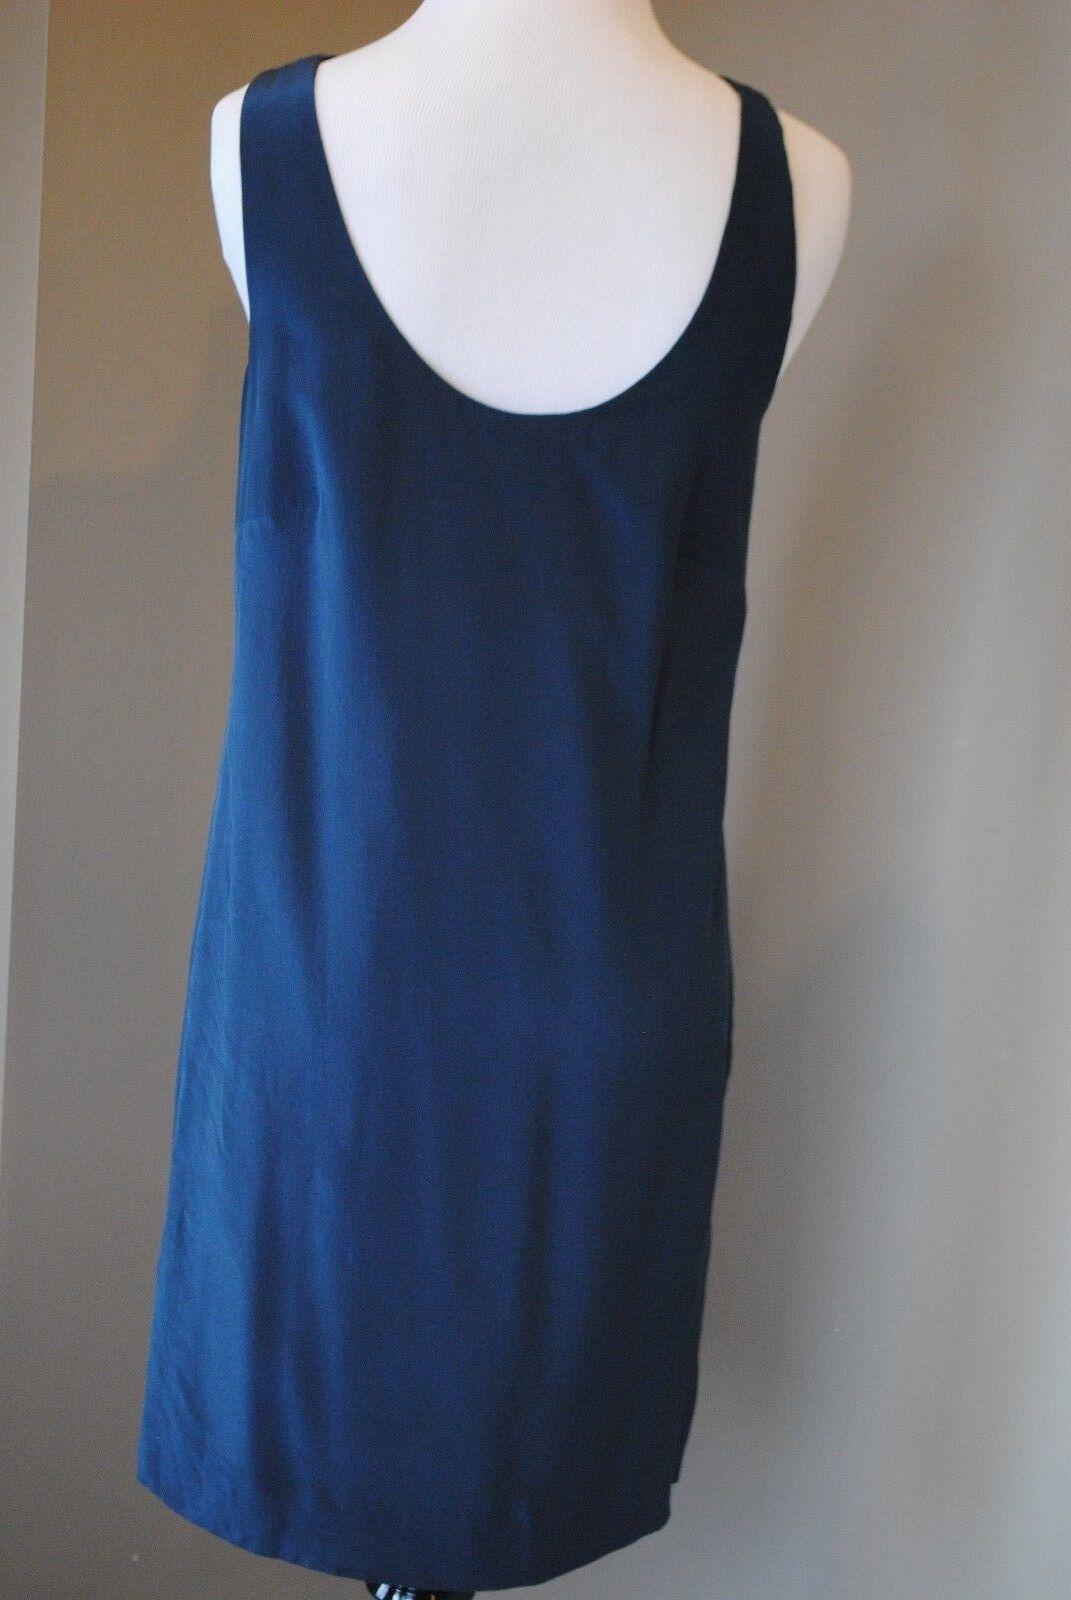 NWT J Crew Twist Back Silk Dress in Night Shadow Blau Sz 2 XS A7548